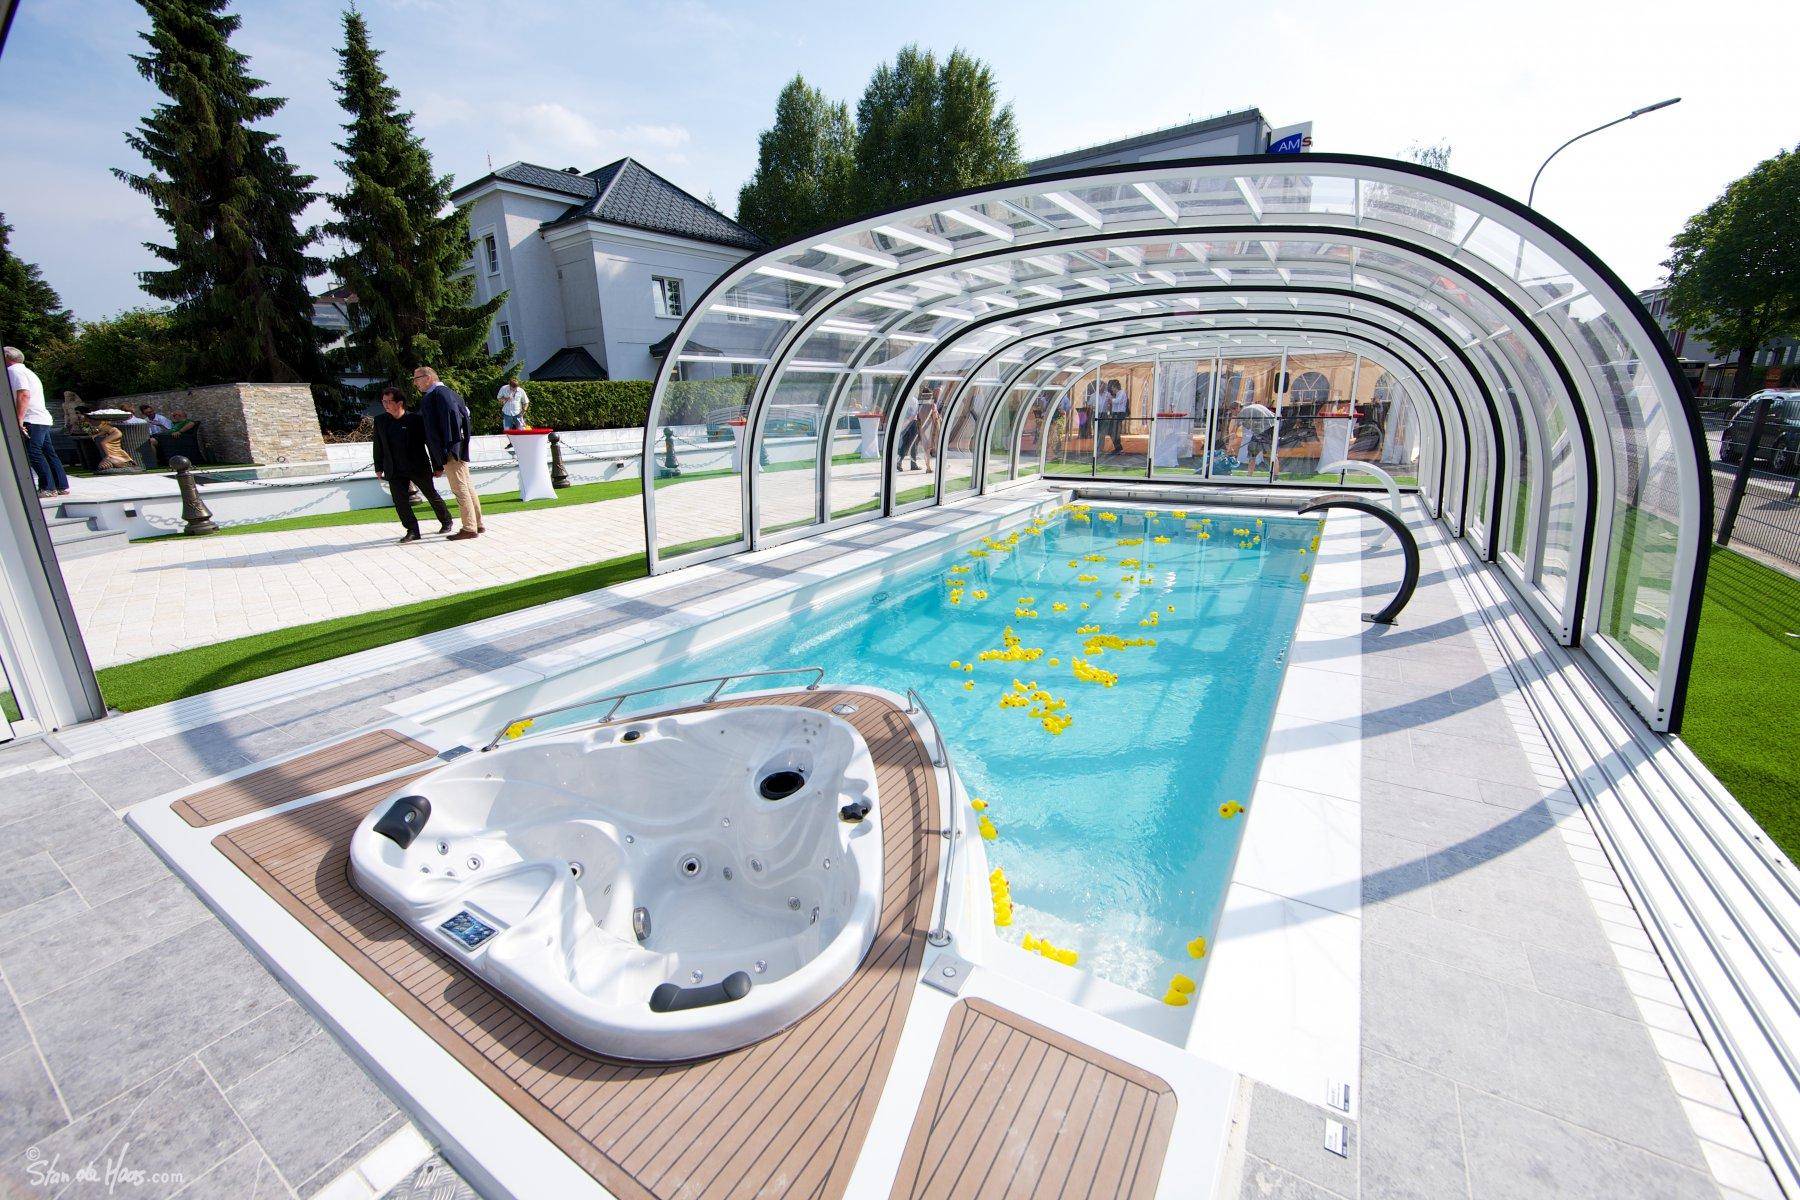 YACHT POOL - Compass Pools